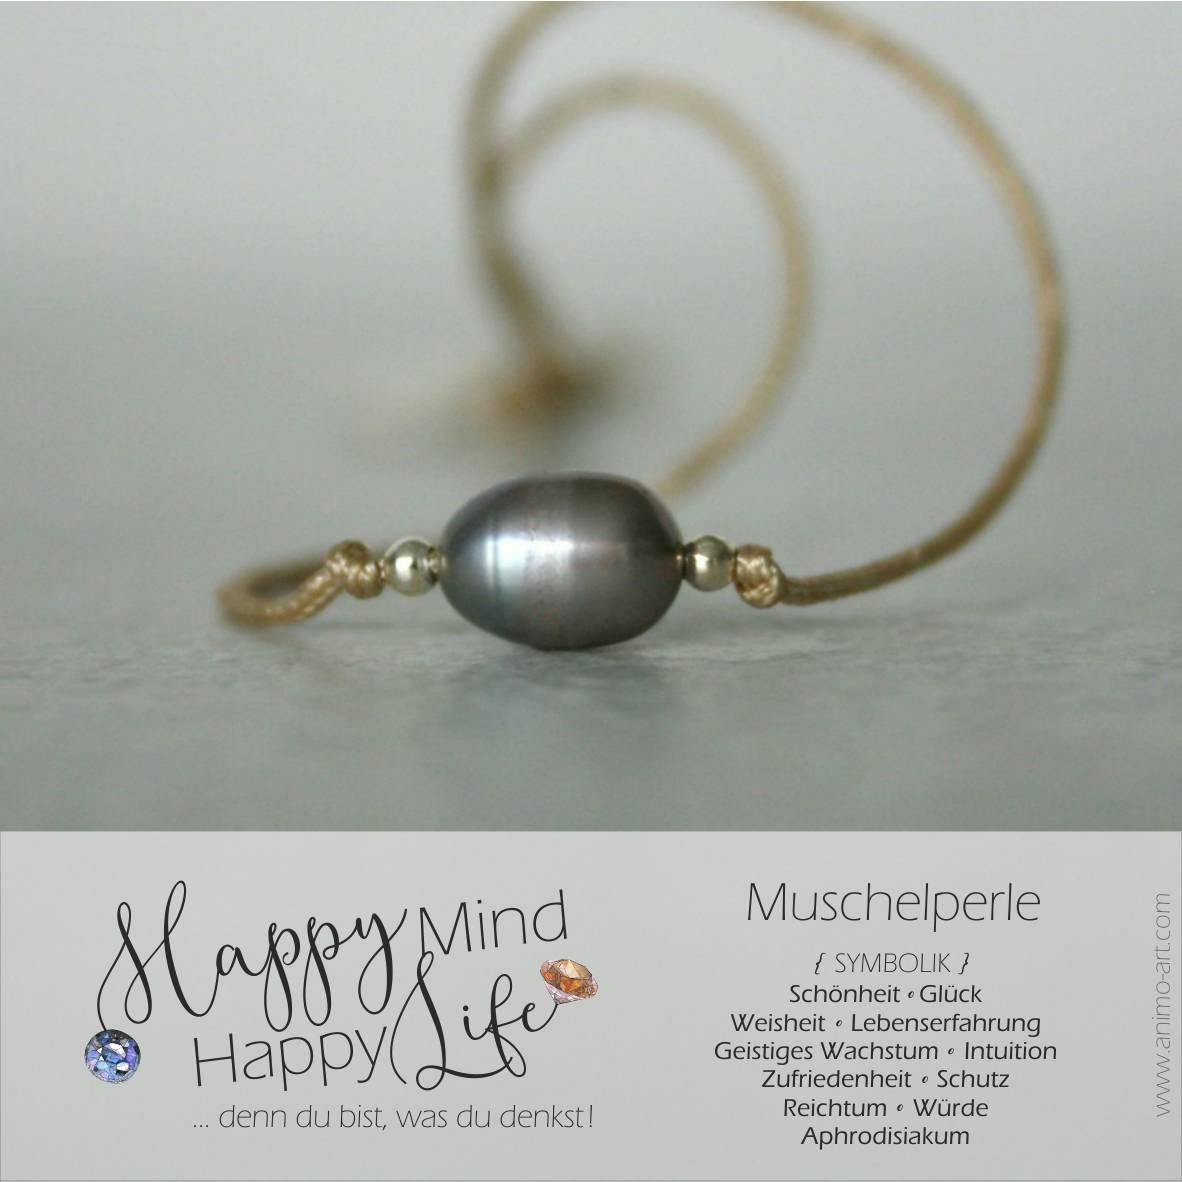 Muschel Perle Bedeutung / Schmuck mit Muschelpelen in beige, grau, rose, verschiedene Farben, Happy Mind Happy Life